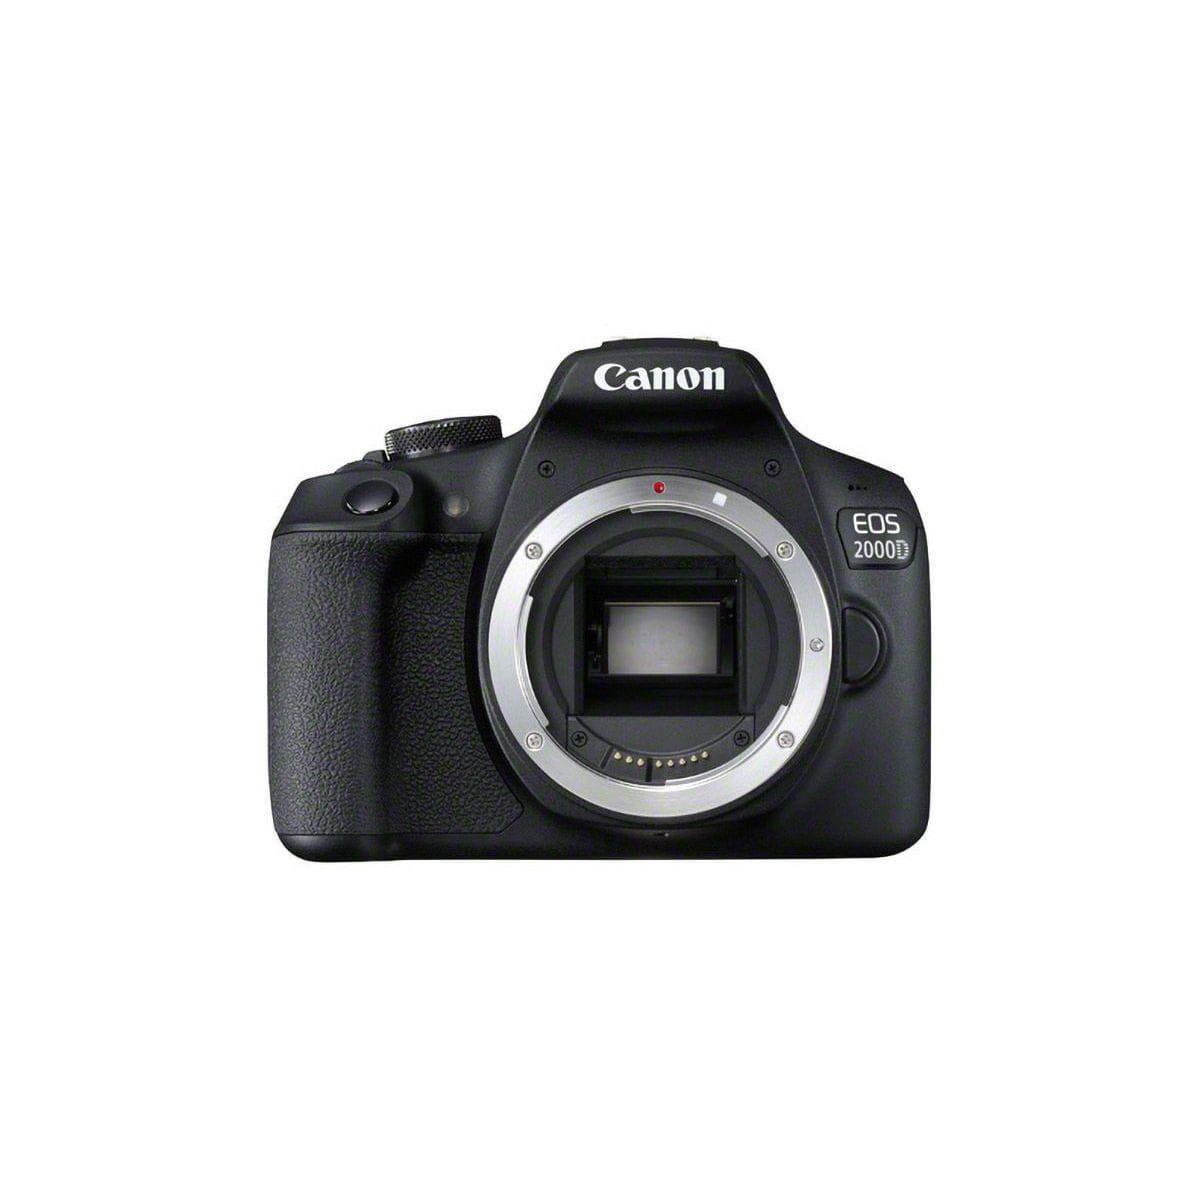 Reflex - Canon EOS 2000D Boitier Nu - Noir